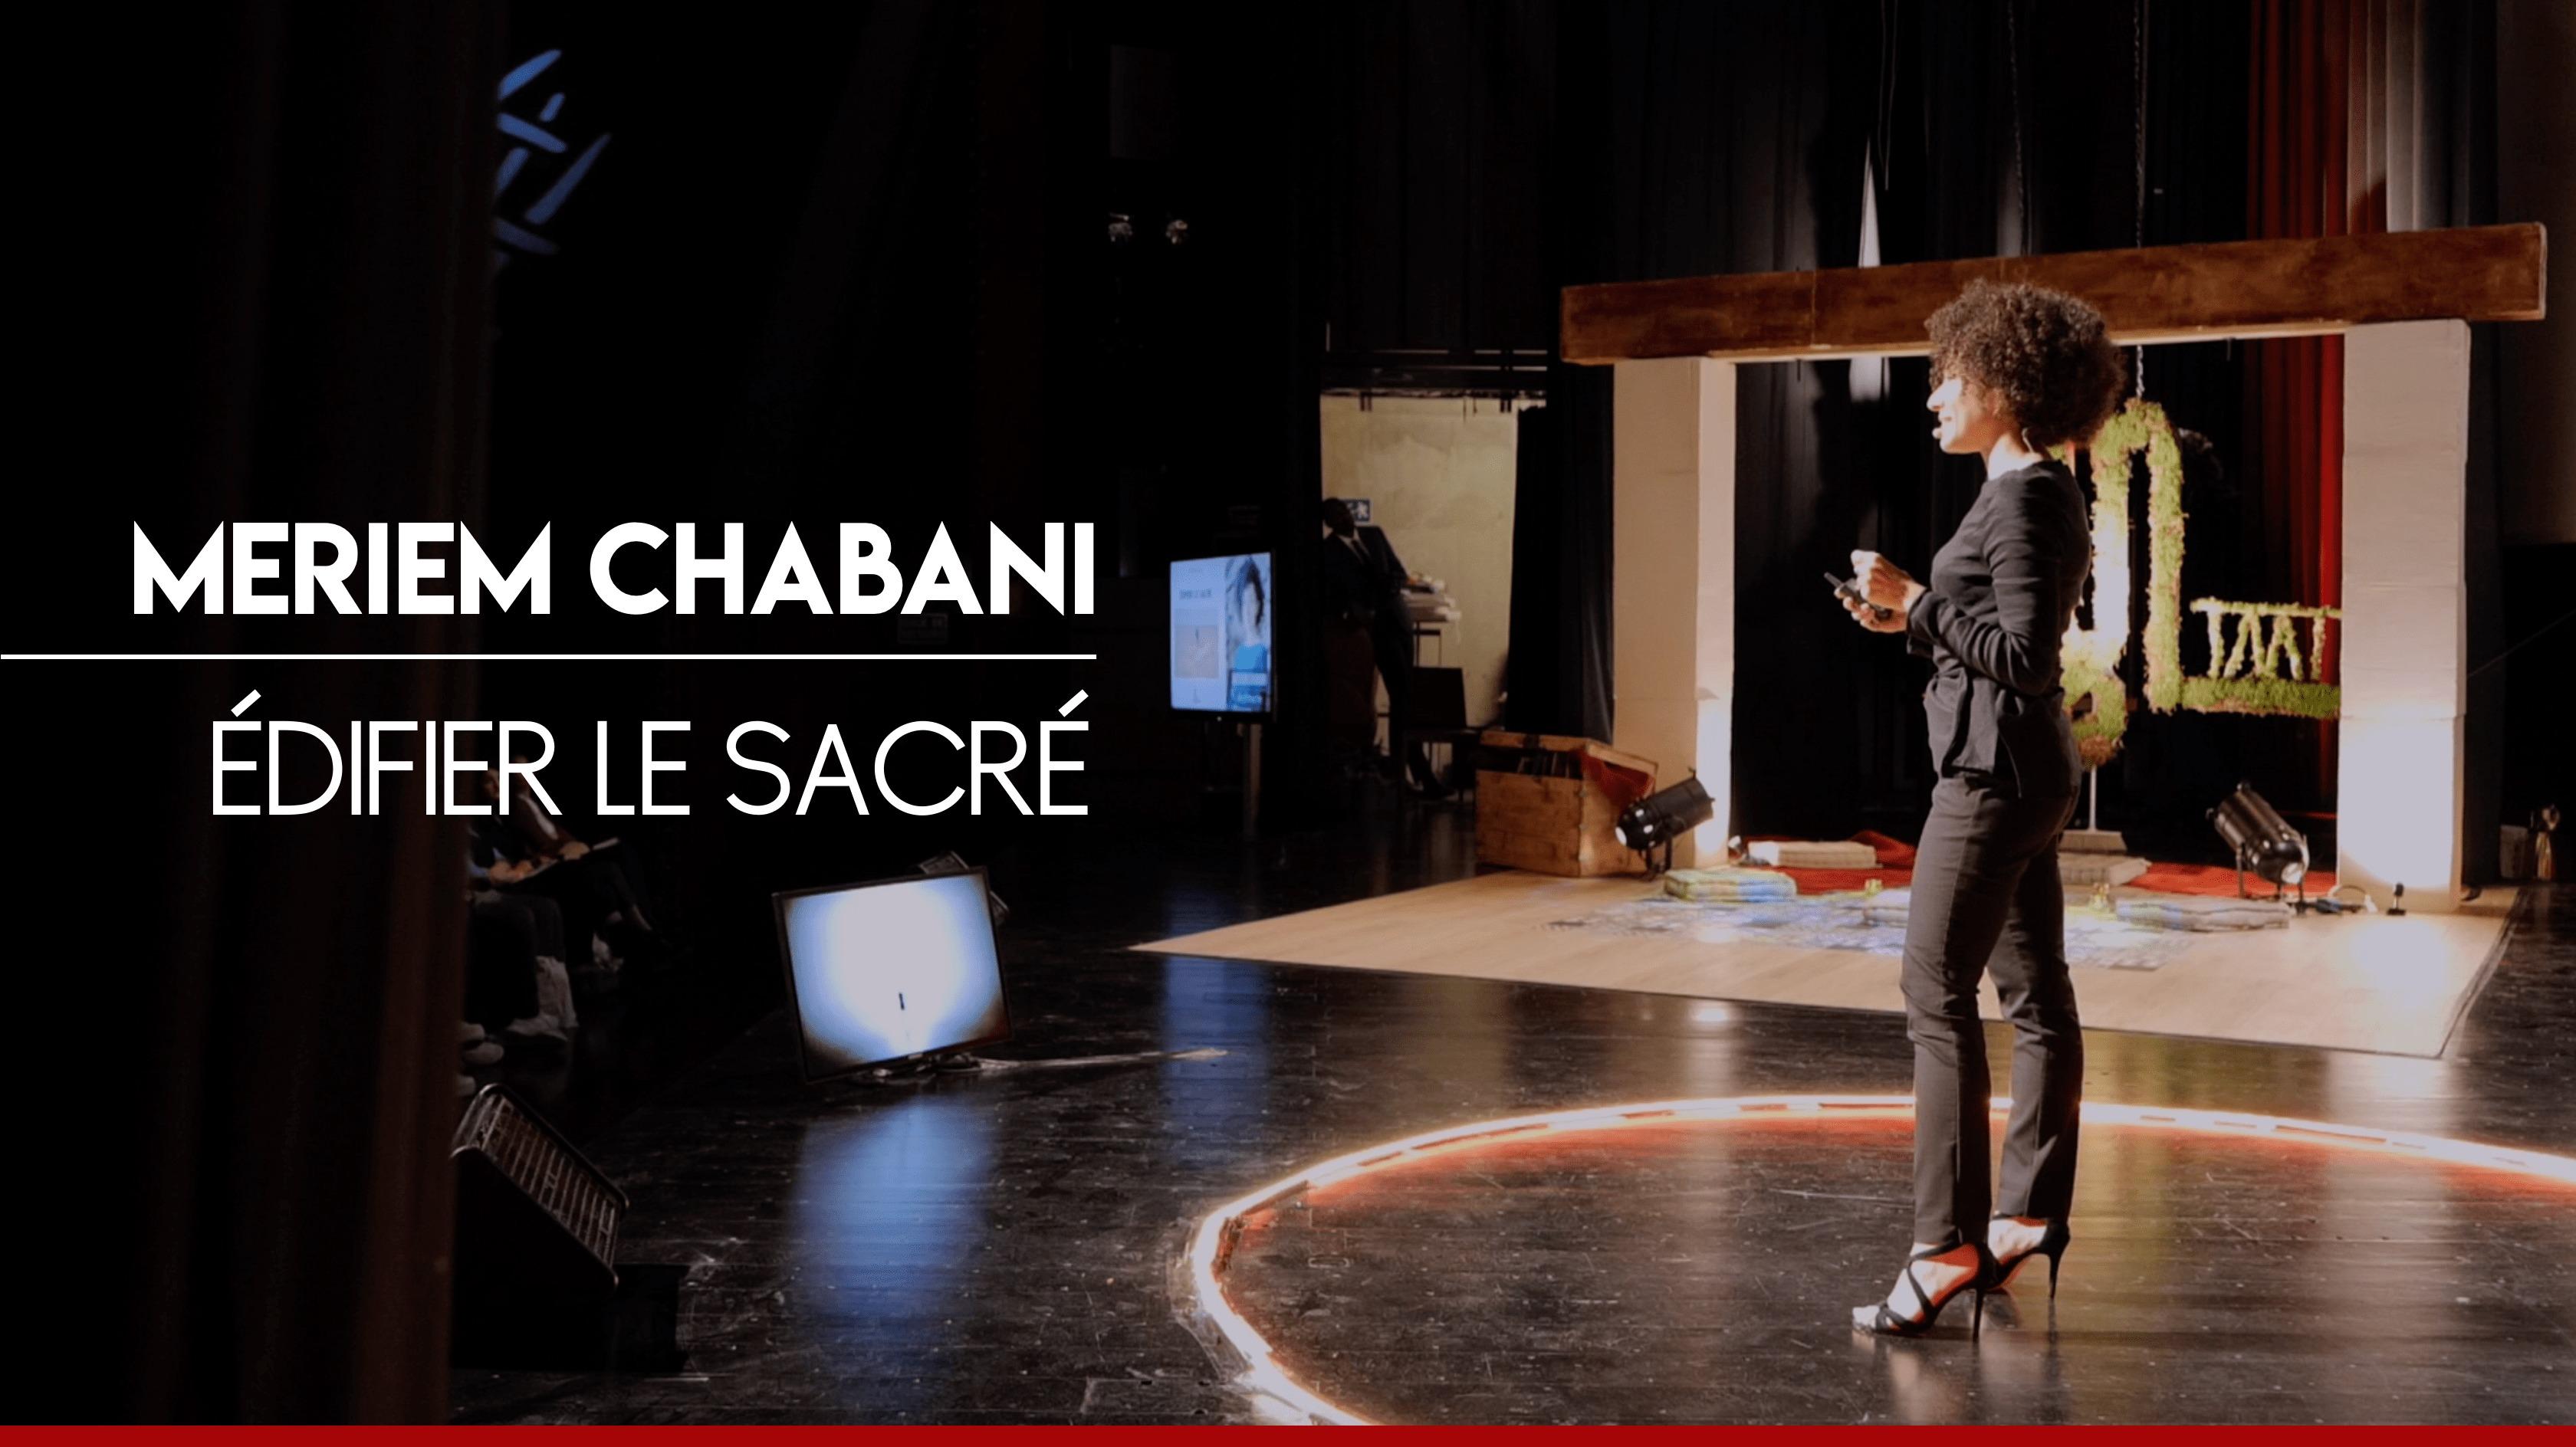 Meriem Chabani